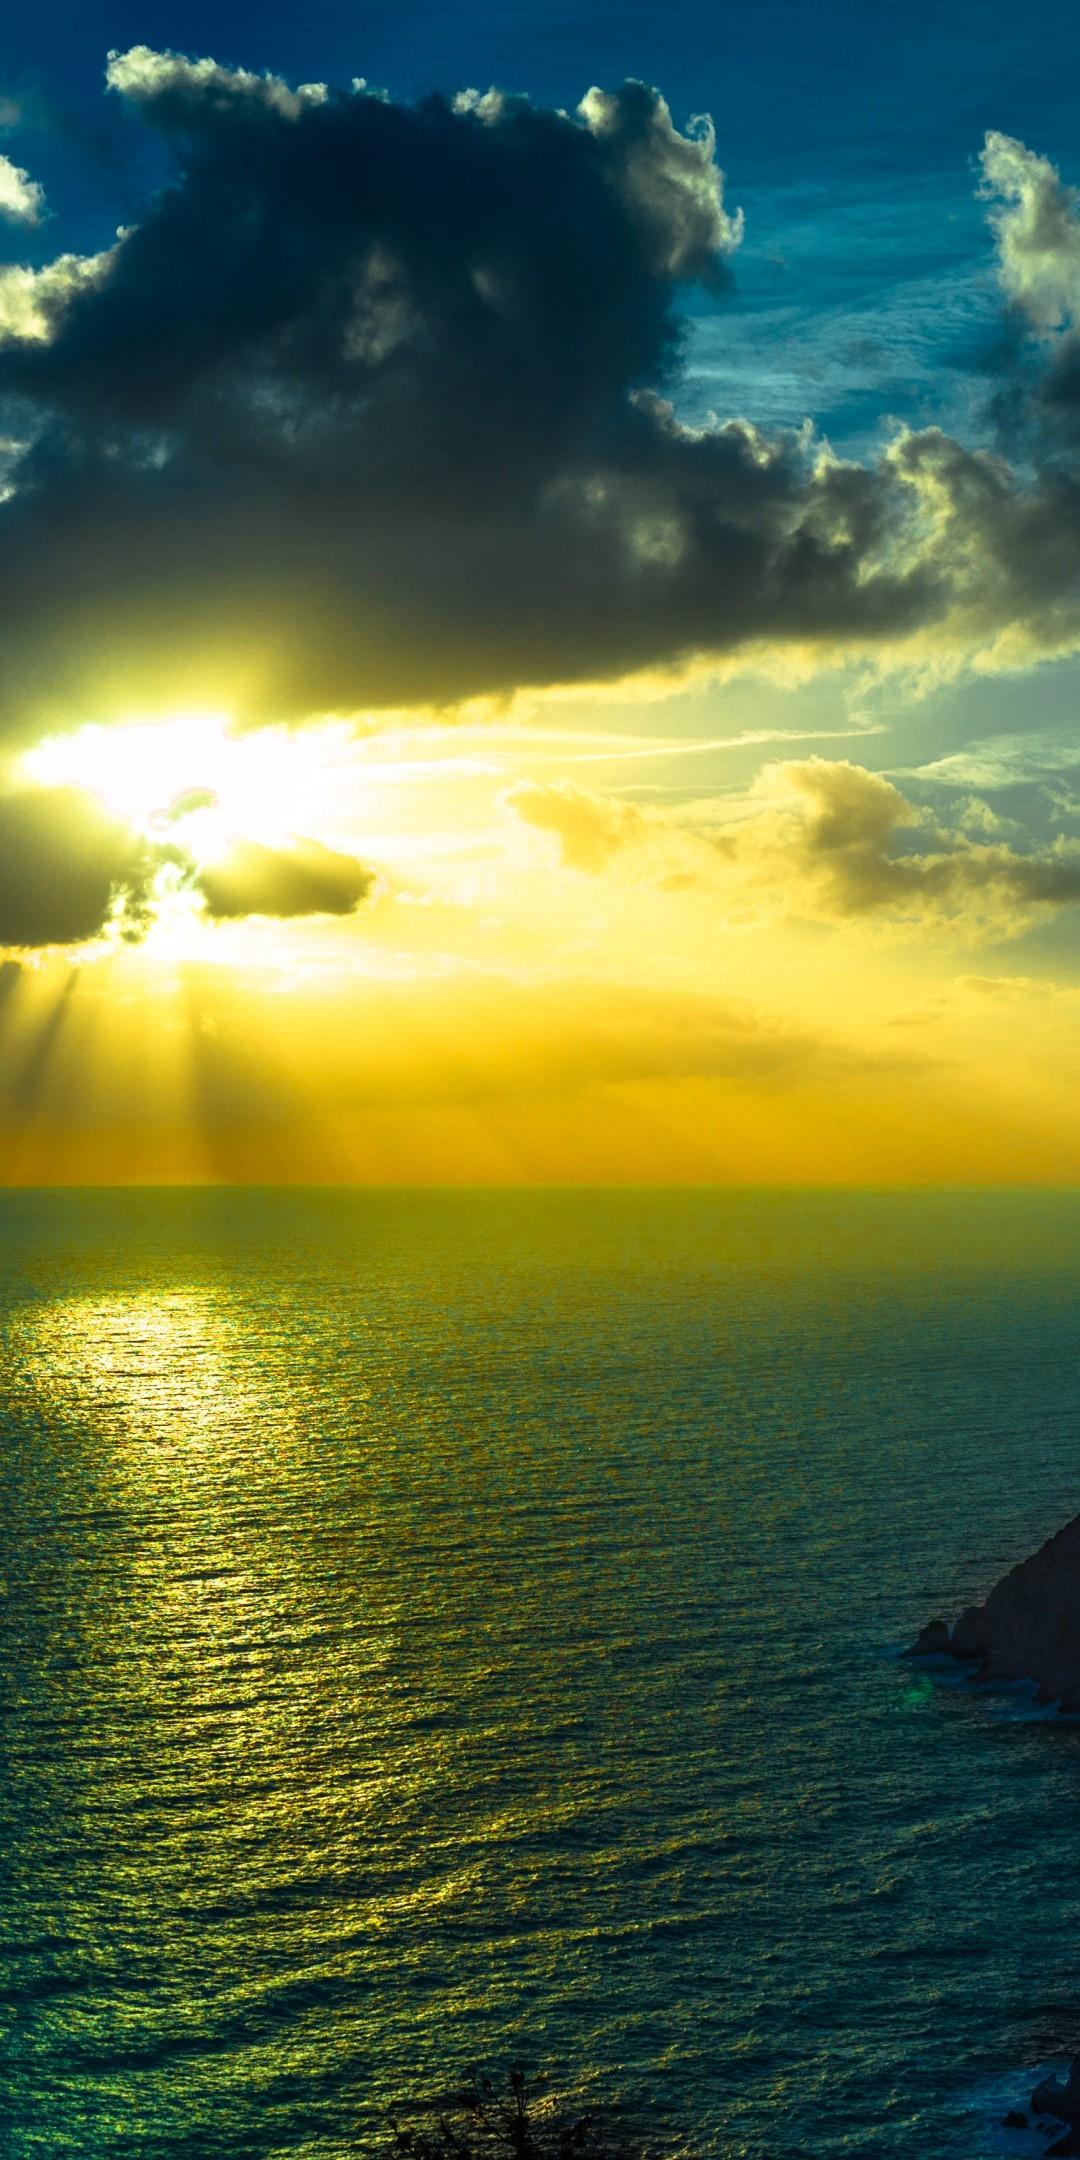 Sunrising Ultra HD Wallpaper [1080x2160]